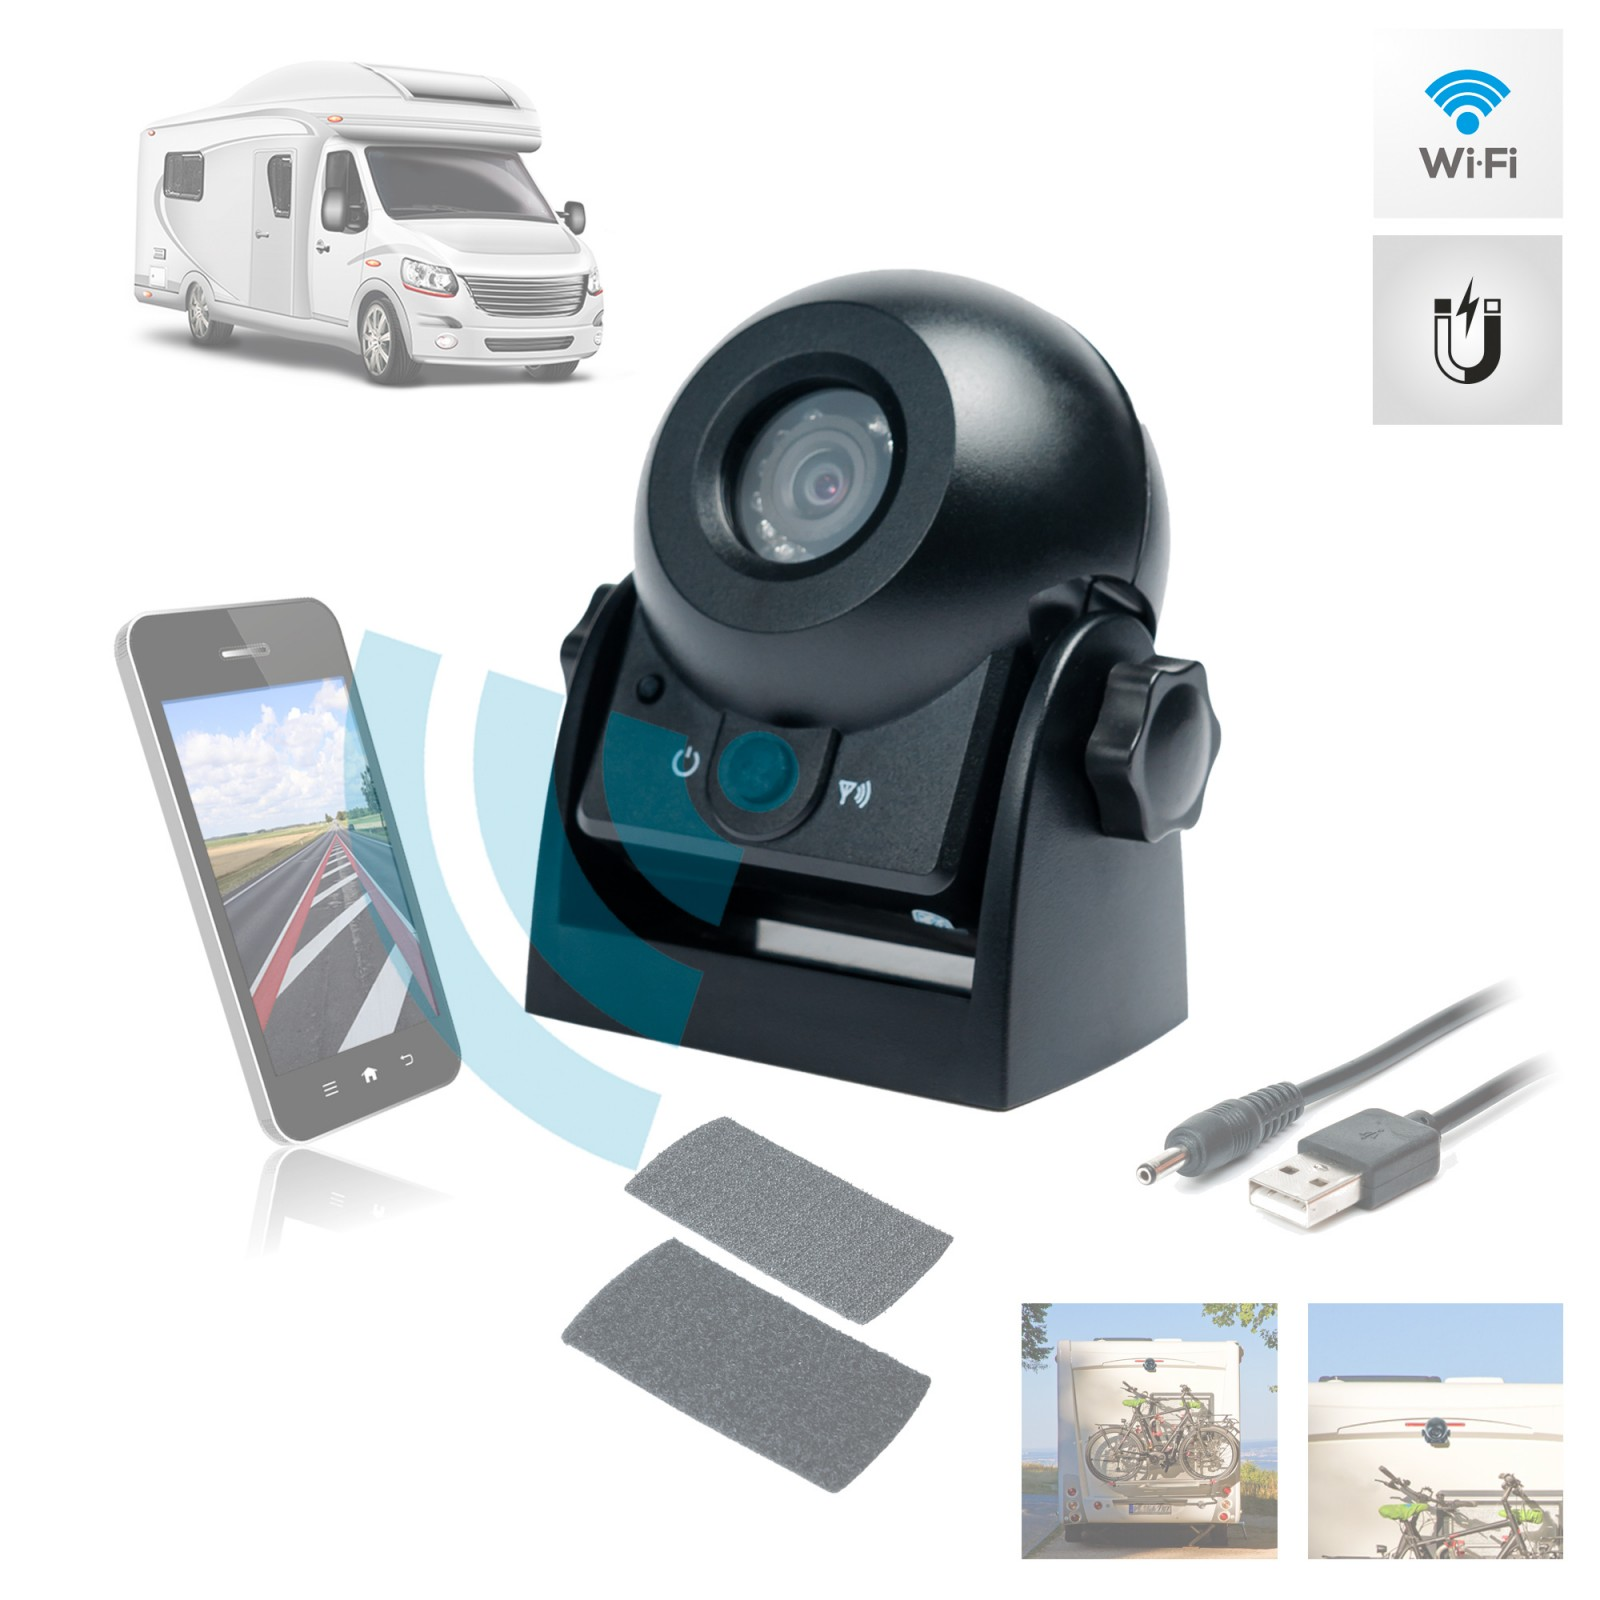 wifi auto rückfahrkamera akku batterie wiederaufladbar magnet wohnmobil lkw  pferdeanhänger transporter lkw pkw